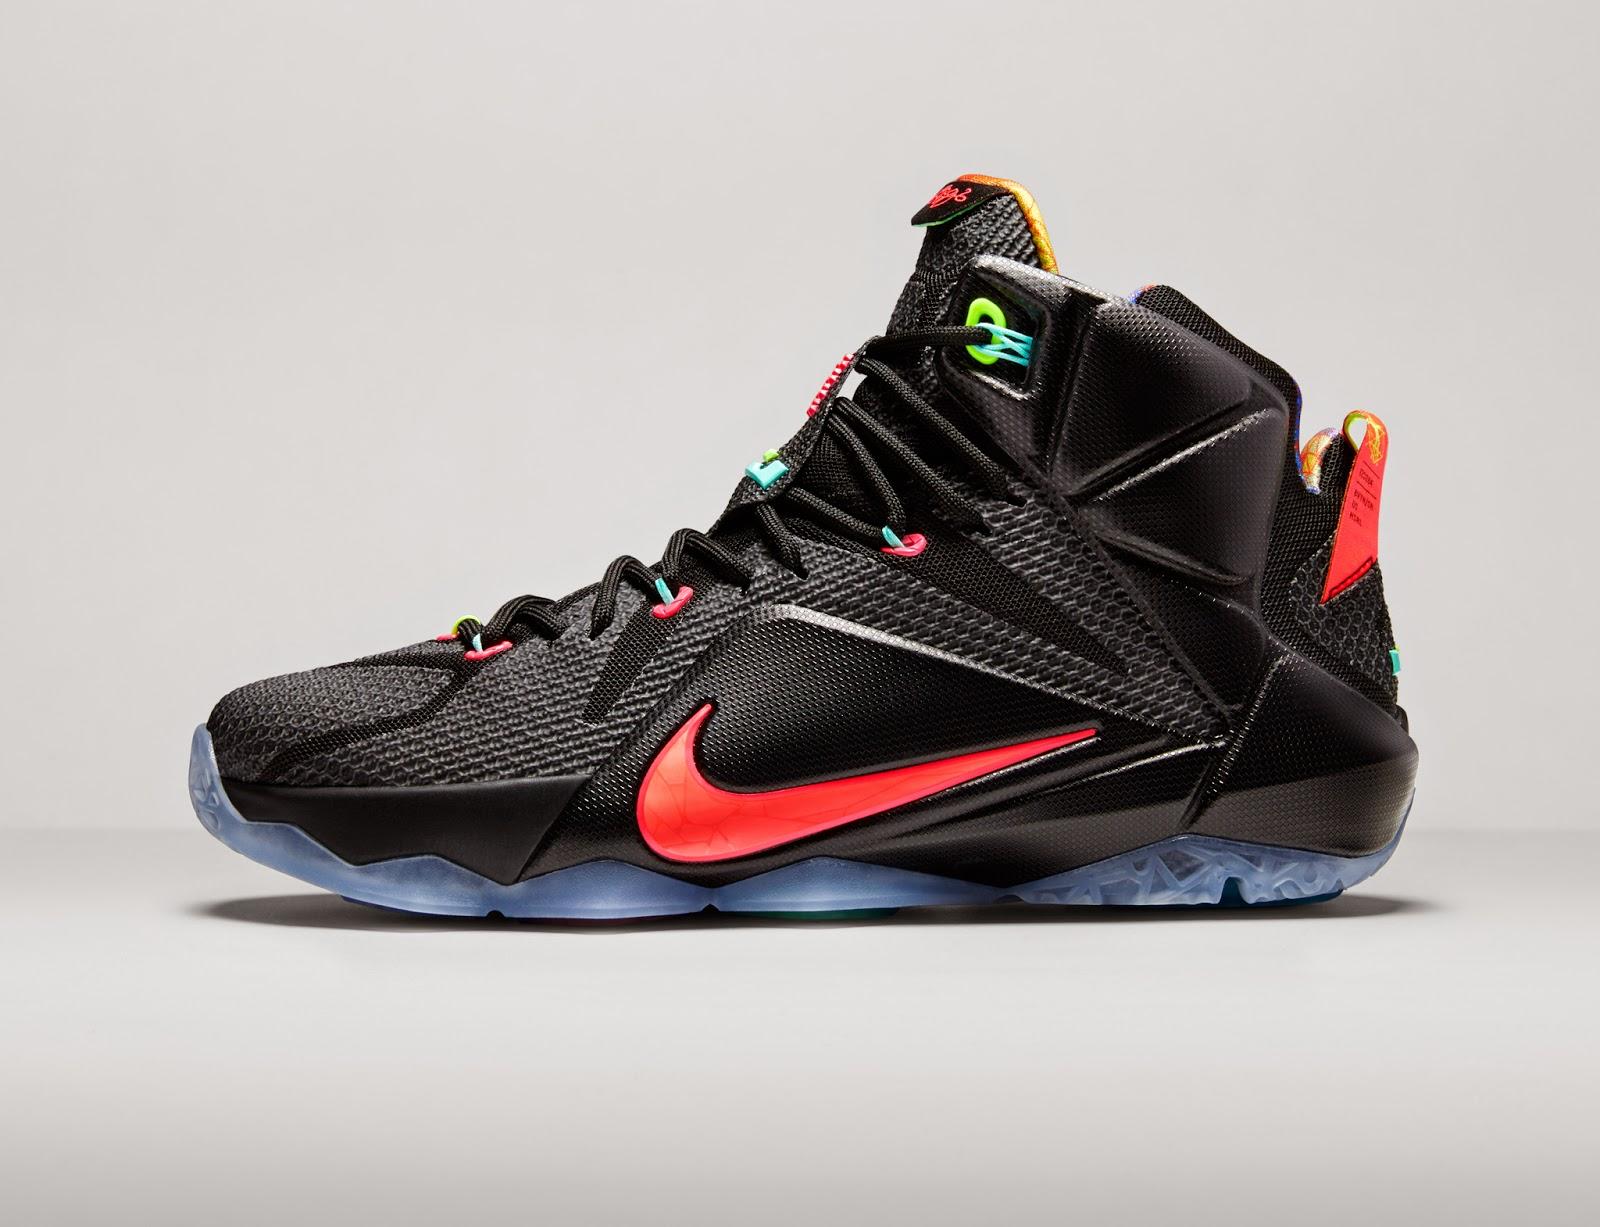 Nike Basketball Team Shoes